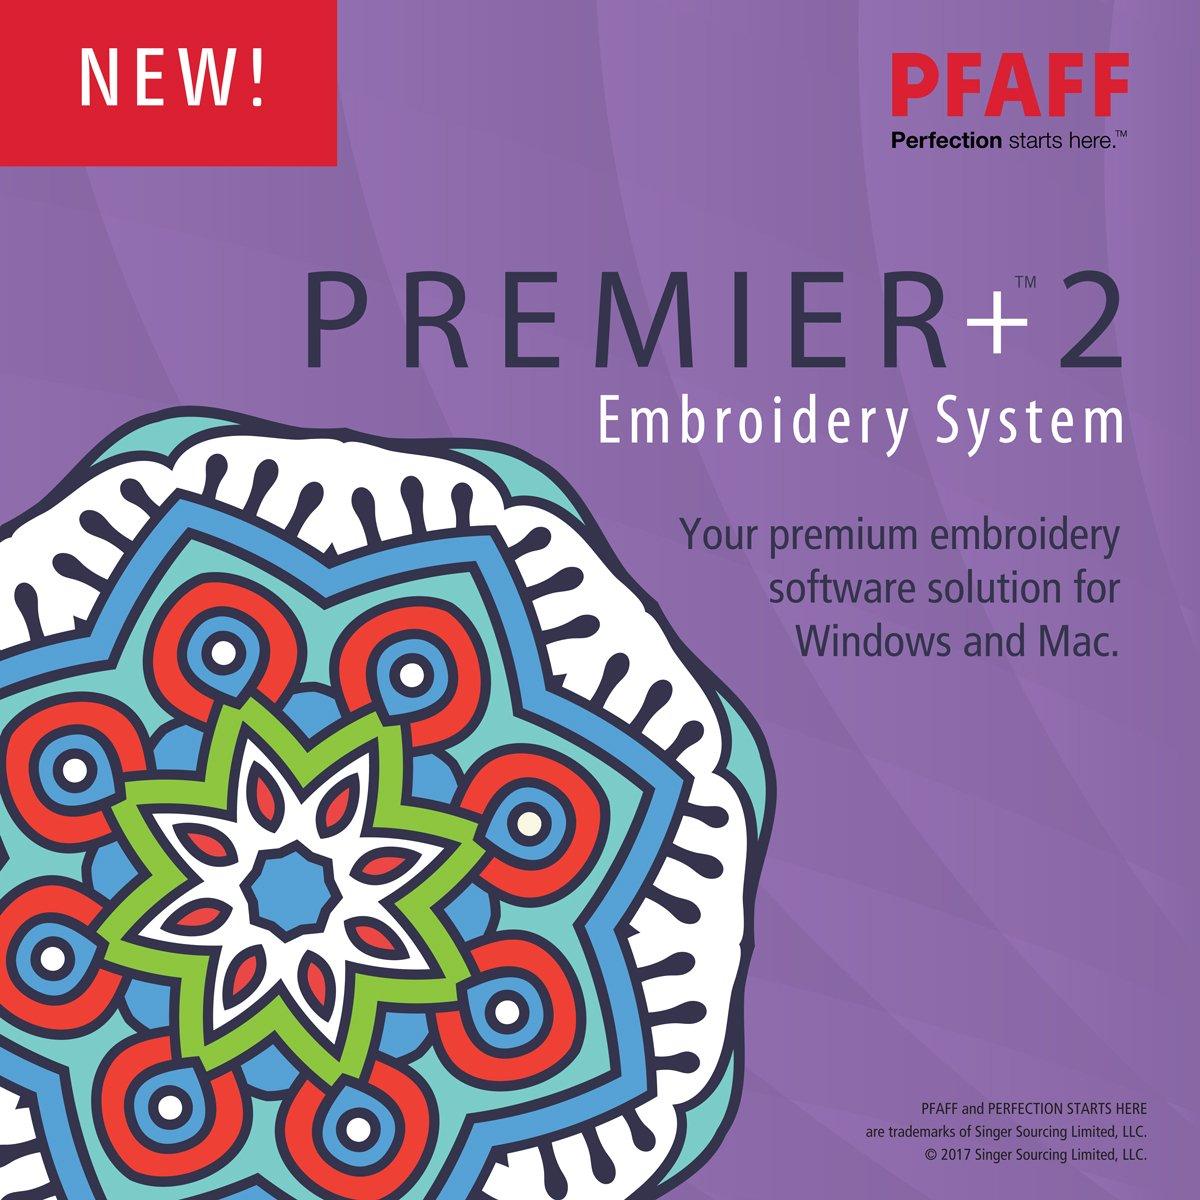 PFAFF Premier+2 ULTRA Embroidery System